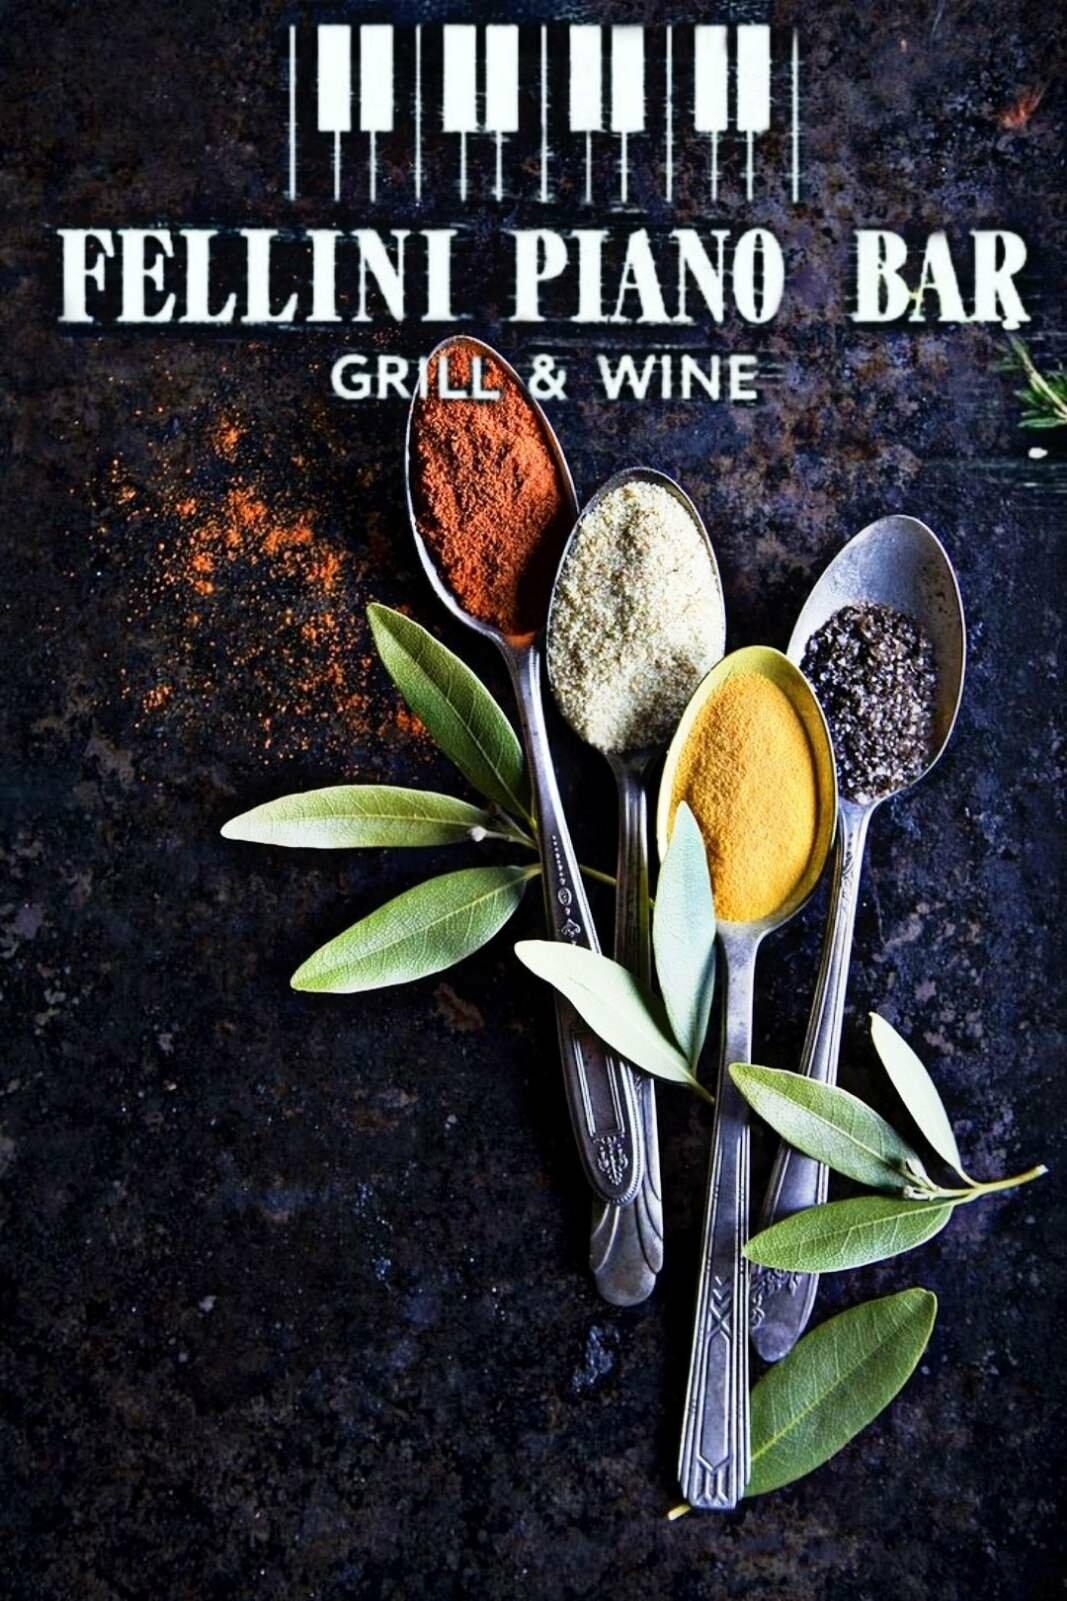 Меню Fellini Piano Bar, фото-1